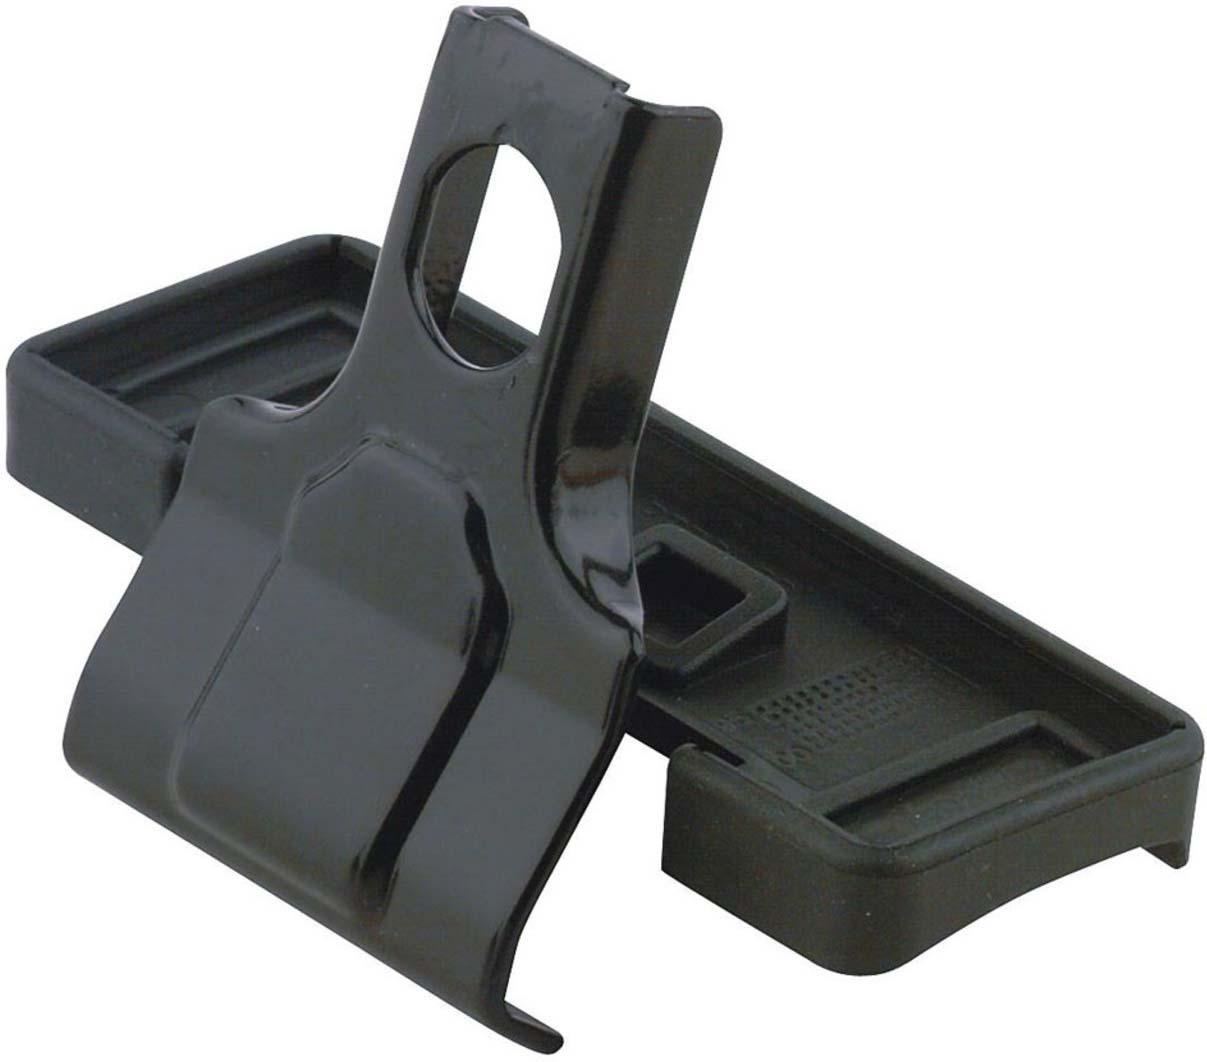 Установочный комплект Thule, для автобагажника. 1574 установочный комплект для велокрепления thule backpac kit 973 16